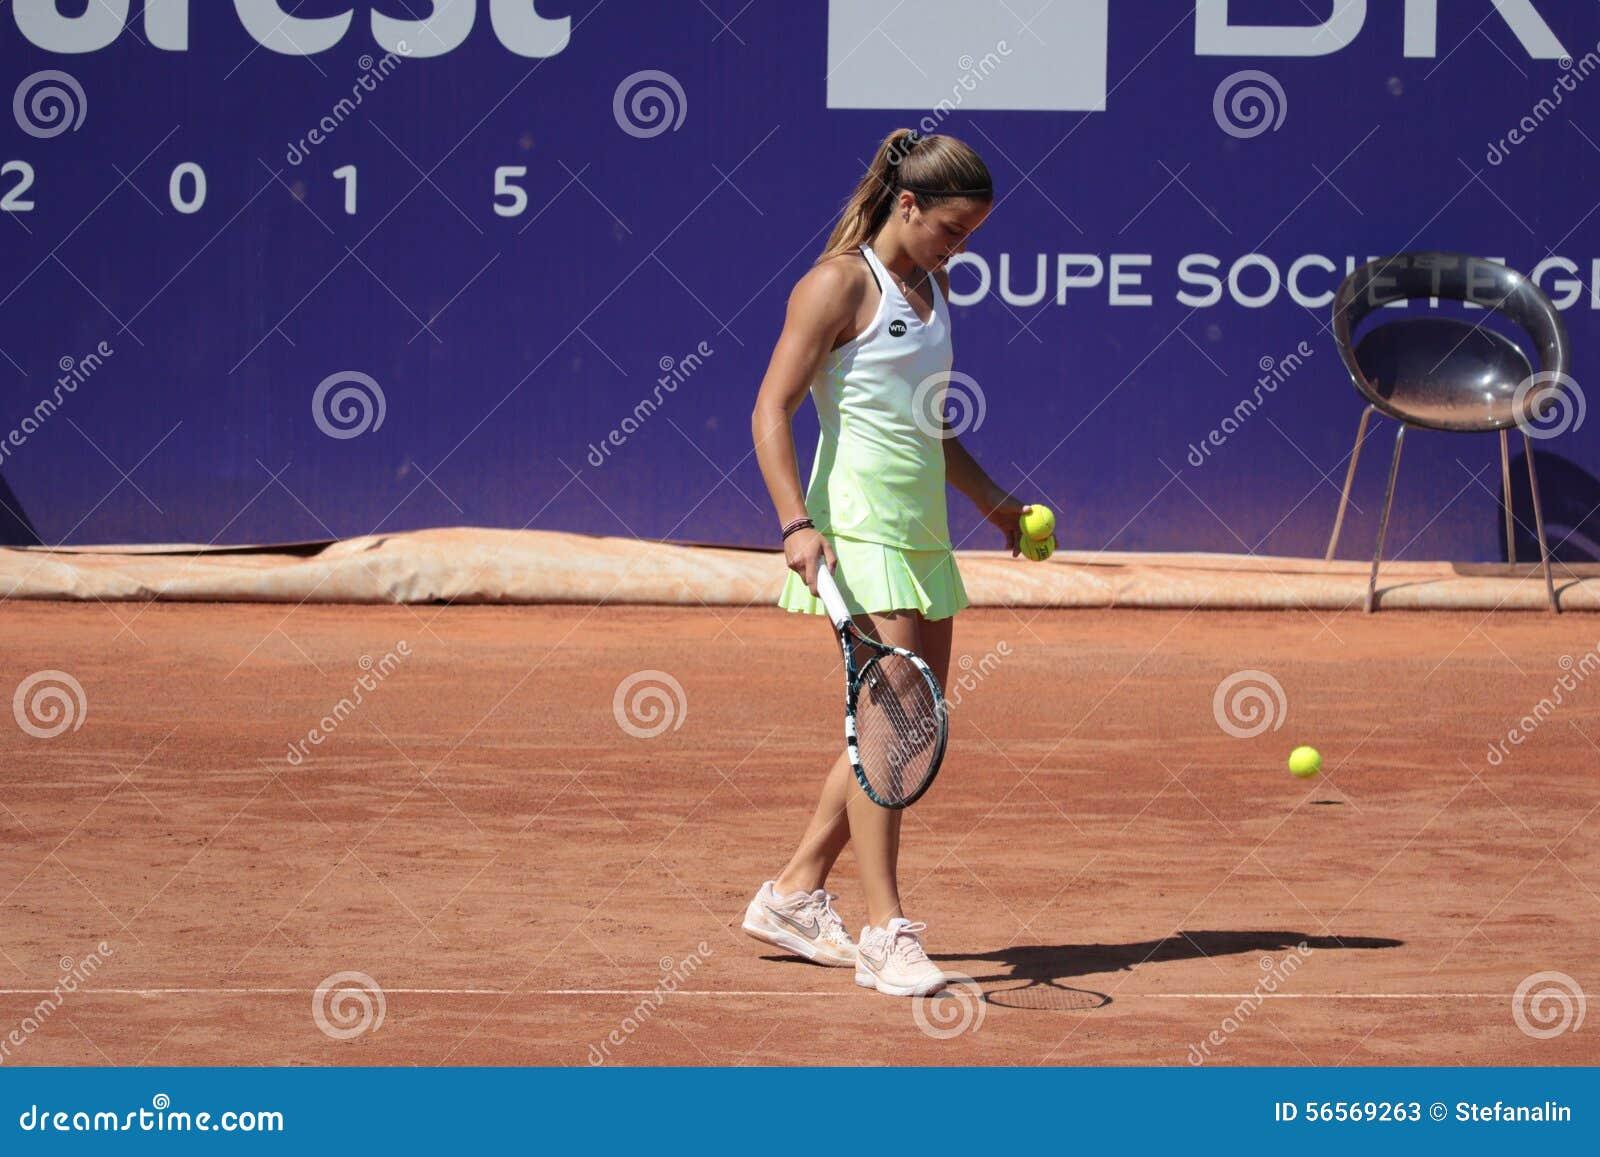 Download Η ΟΔΓ Βουκουρέστι ανοίγει το 2015 Εκδοτική Στοκ Εικόνες - εικόνα από πρωταθλήματα, buckaroos: 56569263